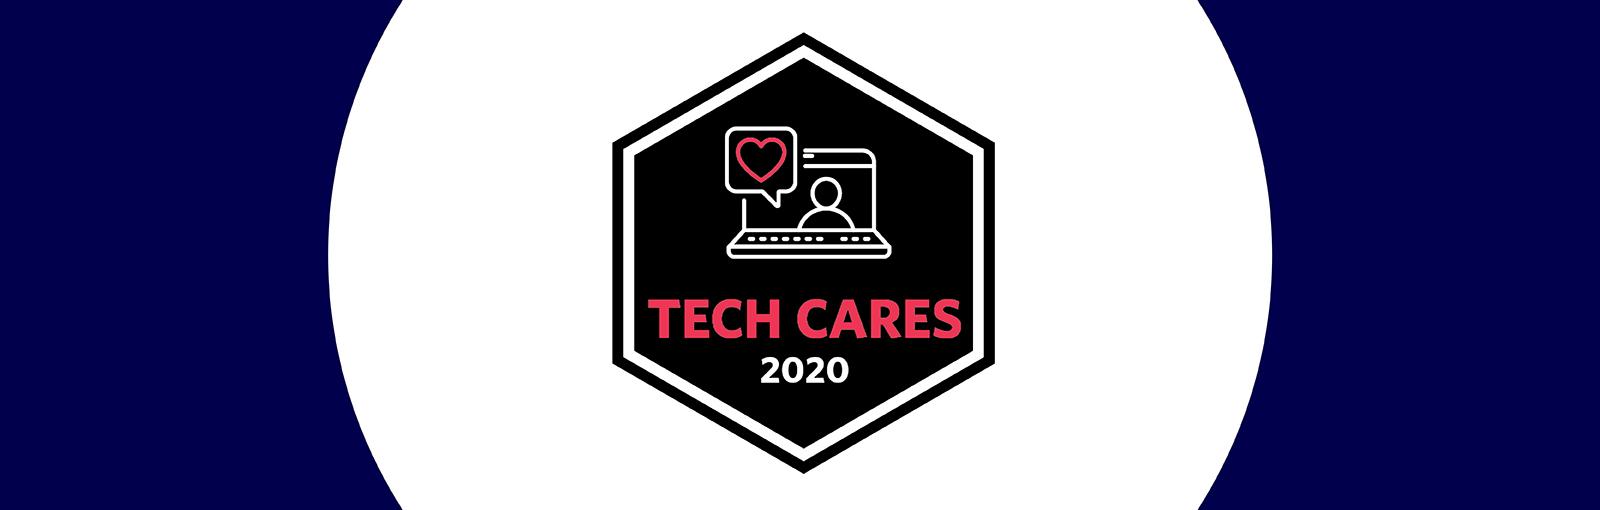 Khoros wins TrustRadius Tech Cares Award